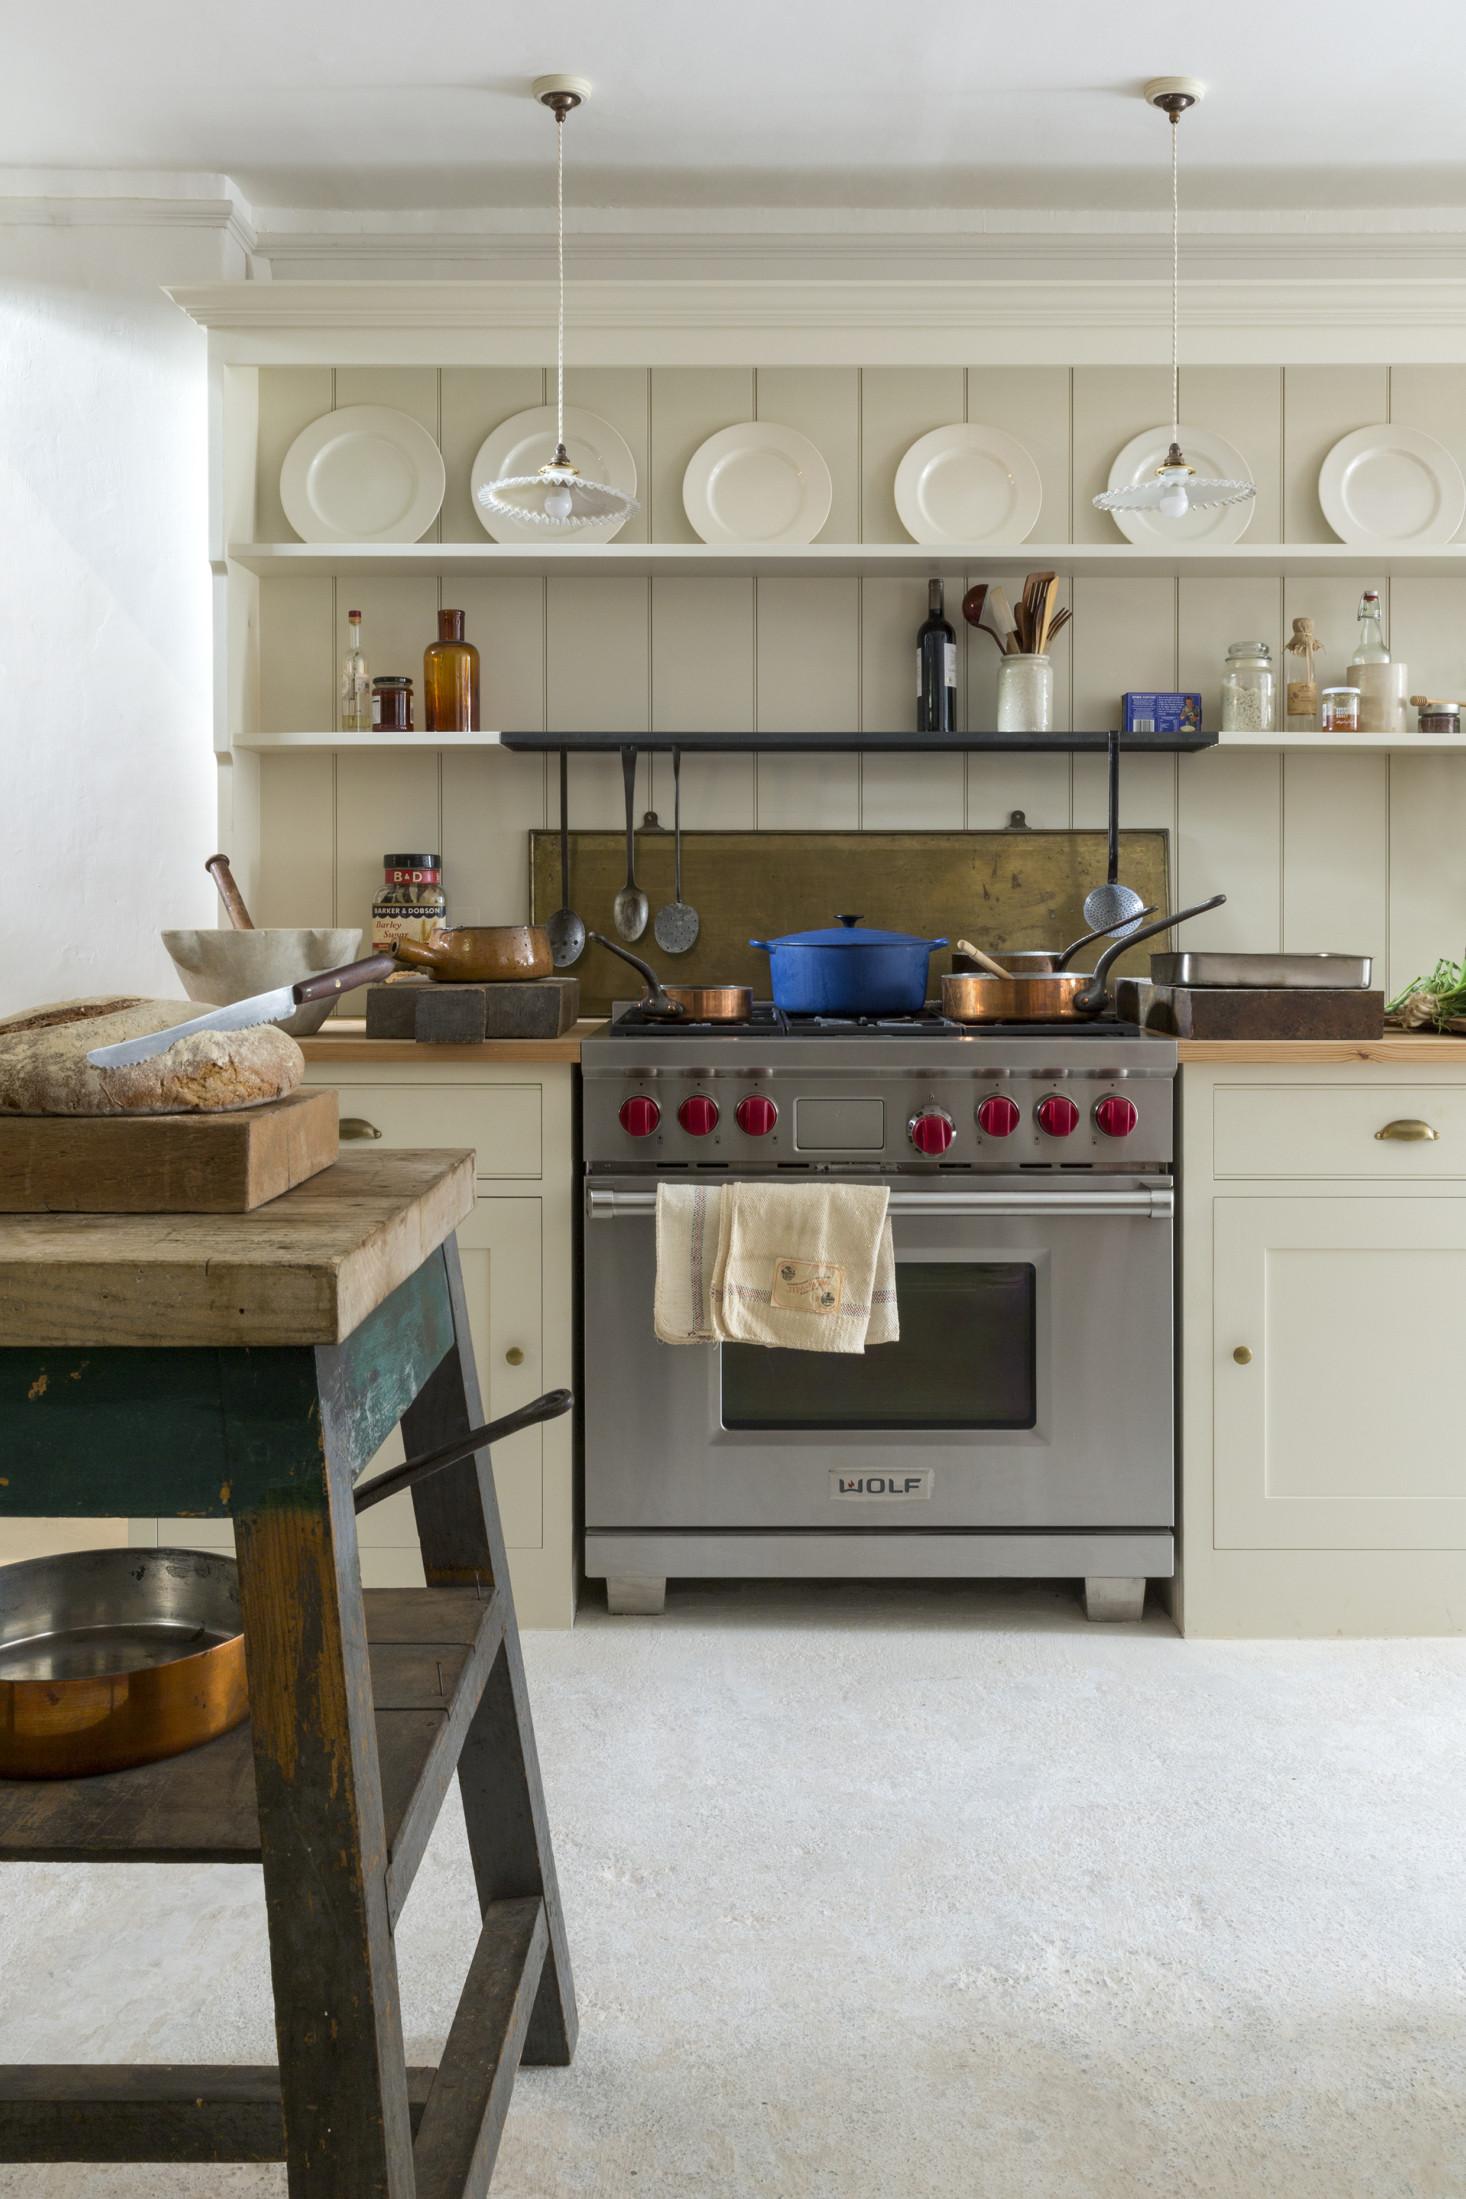 plain-english-kitchen-at-howe-london-8-1466x2199.jpg